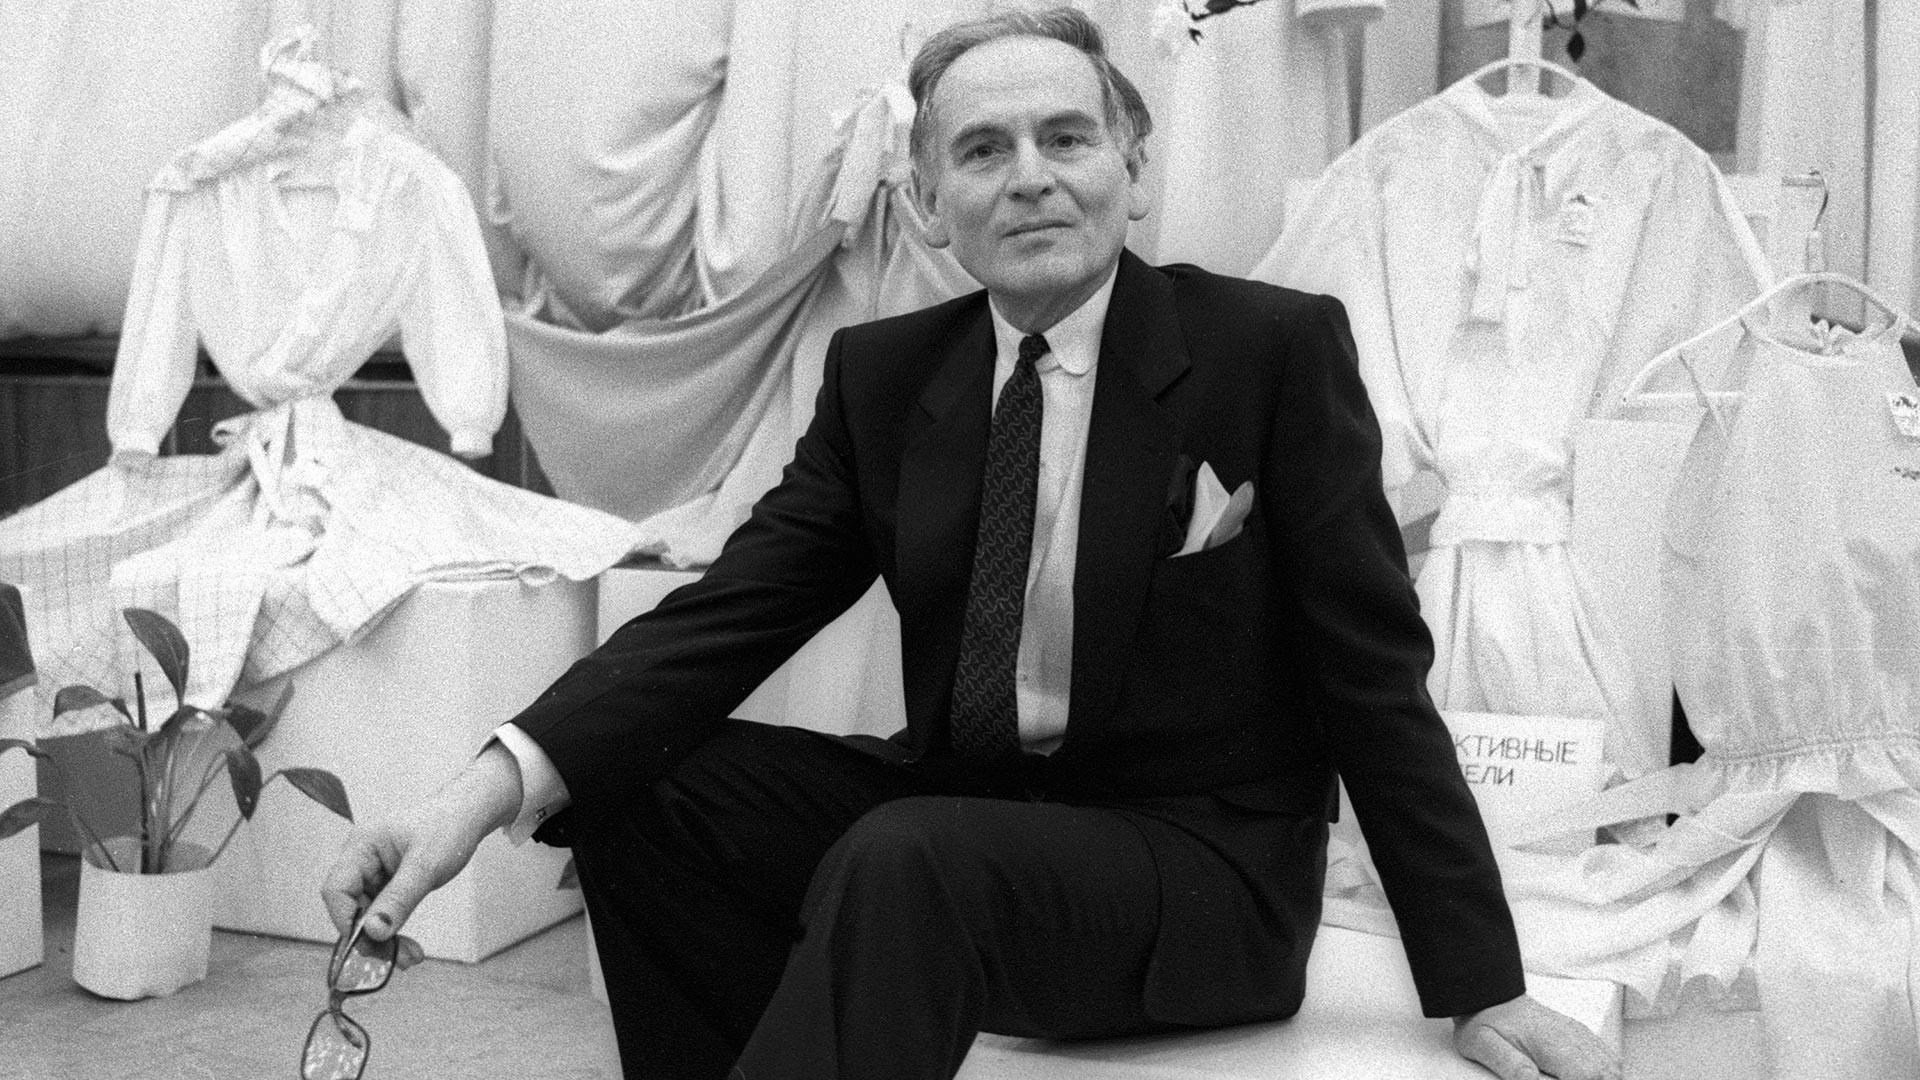 Pierre Cardin en Moscú, 1986